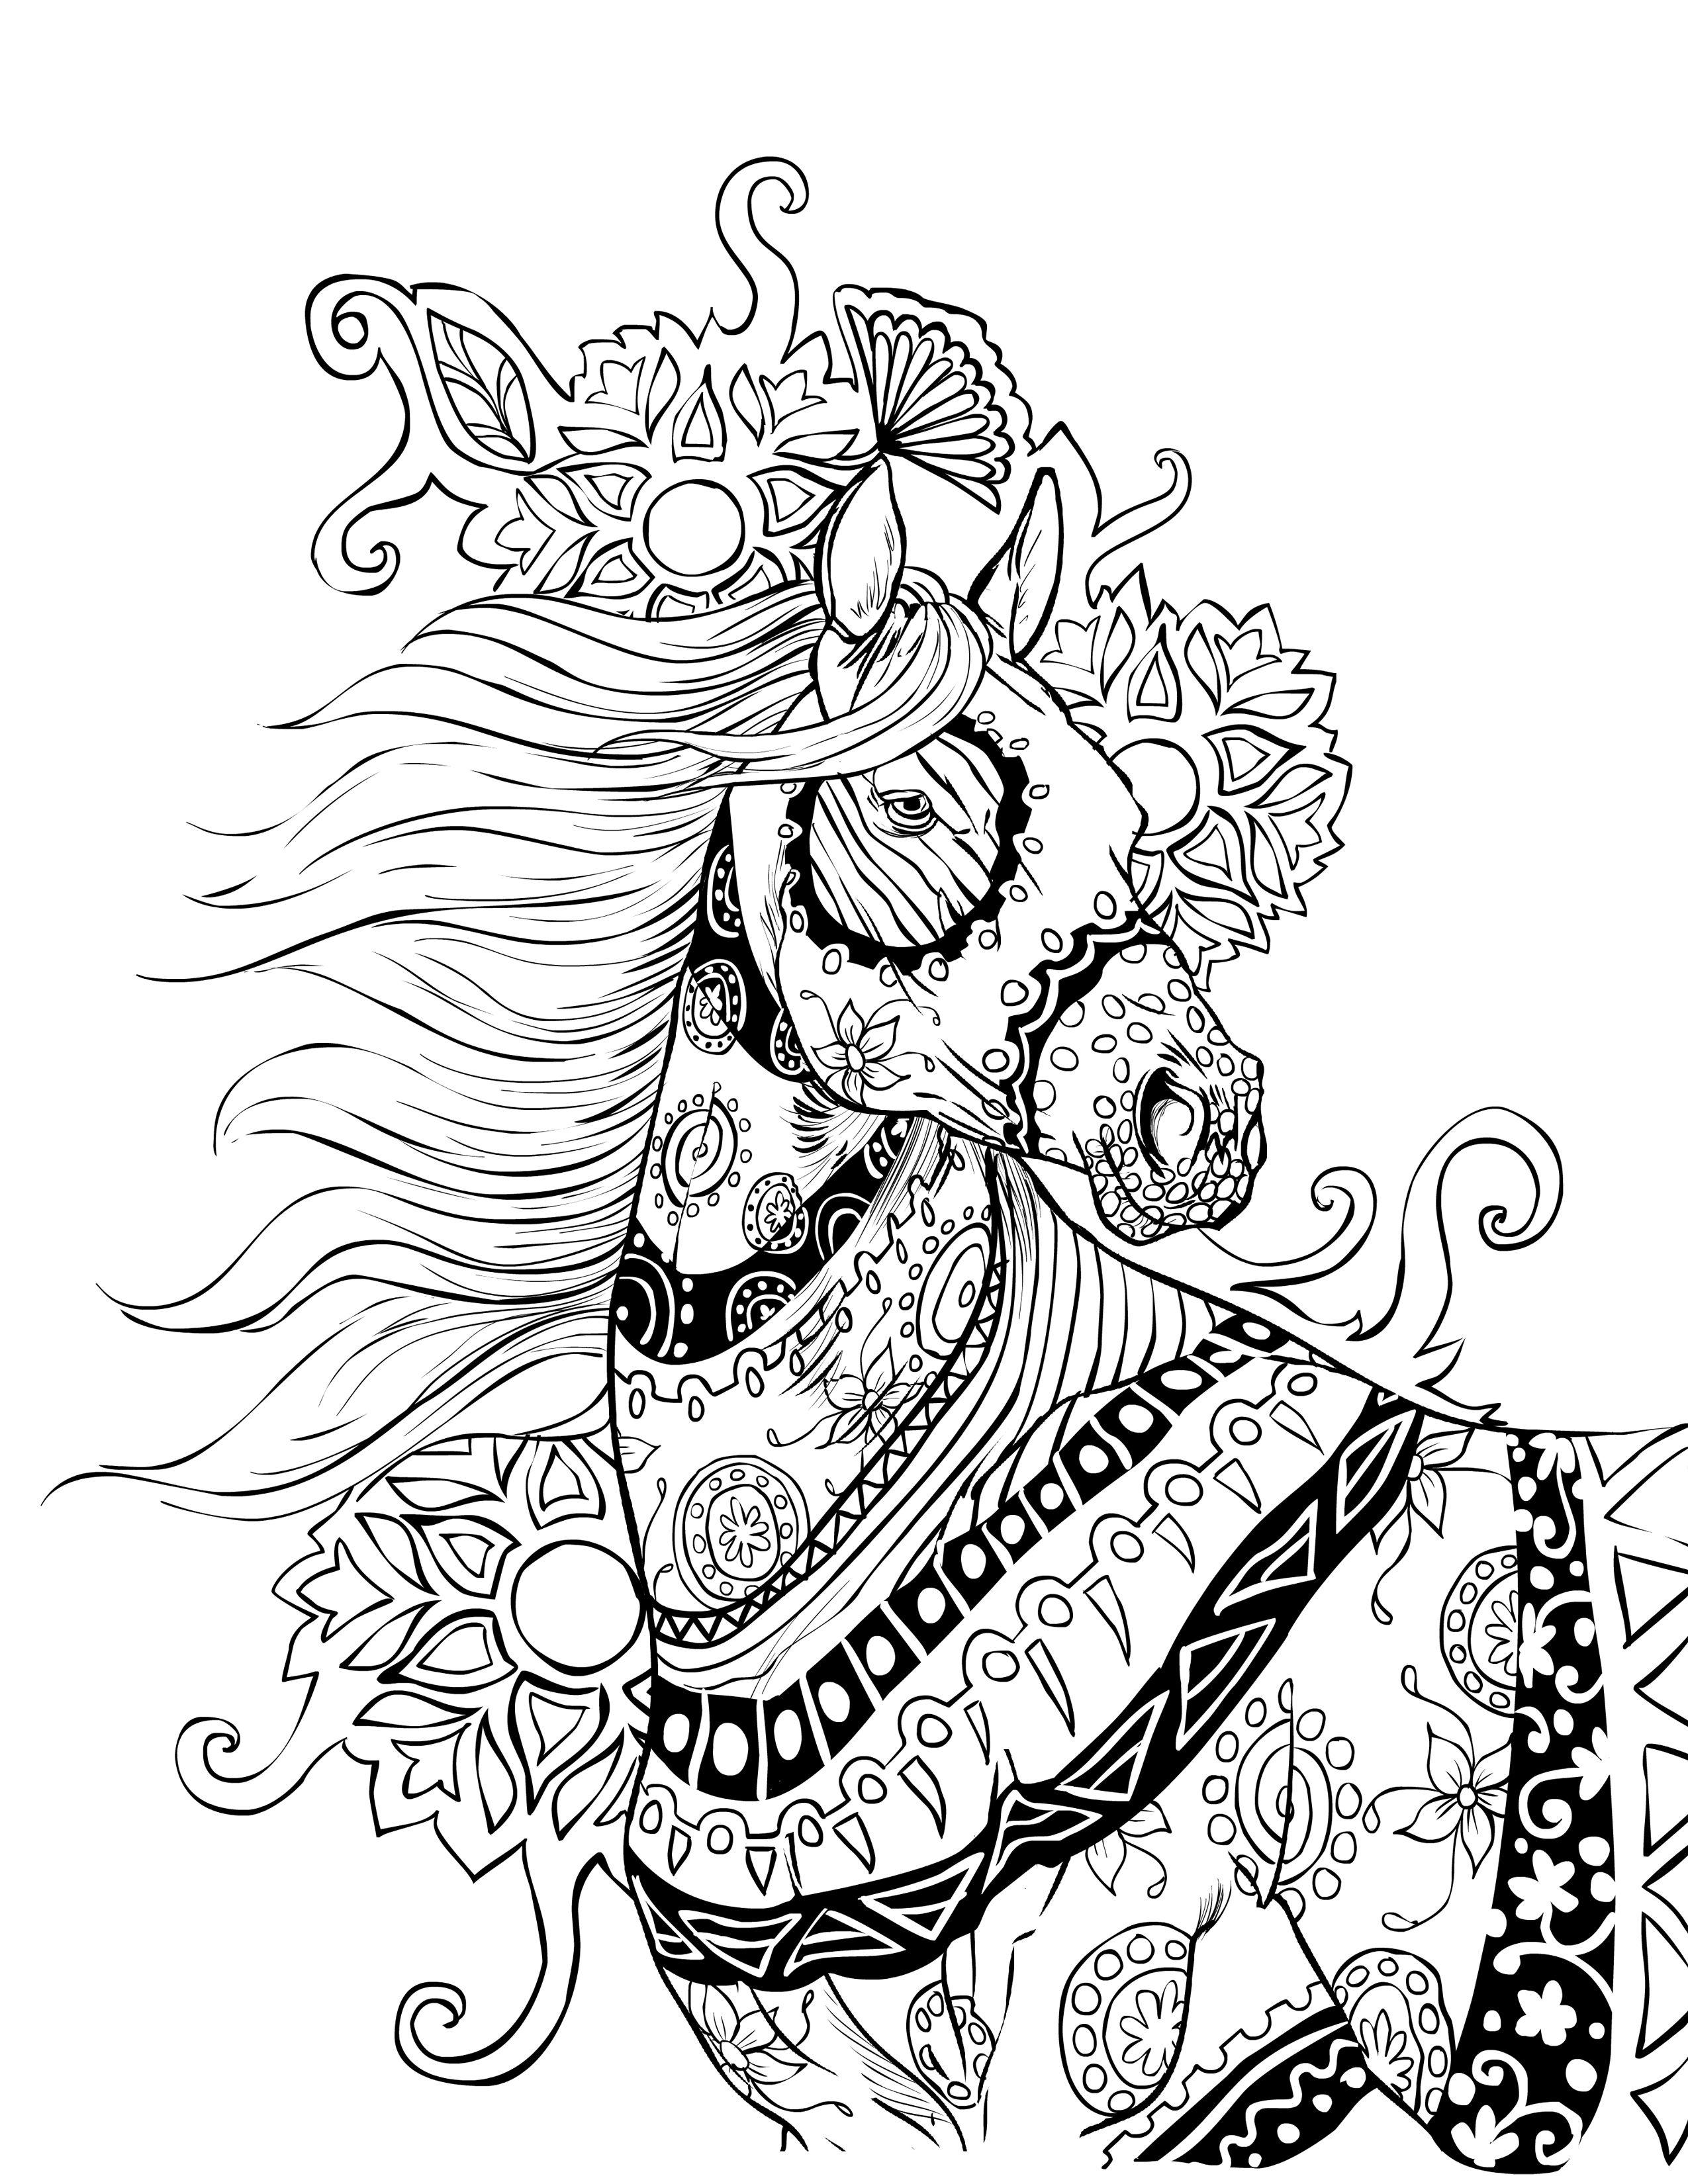 Horse coloring page selah works proyectos de dibujos pinterest